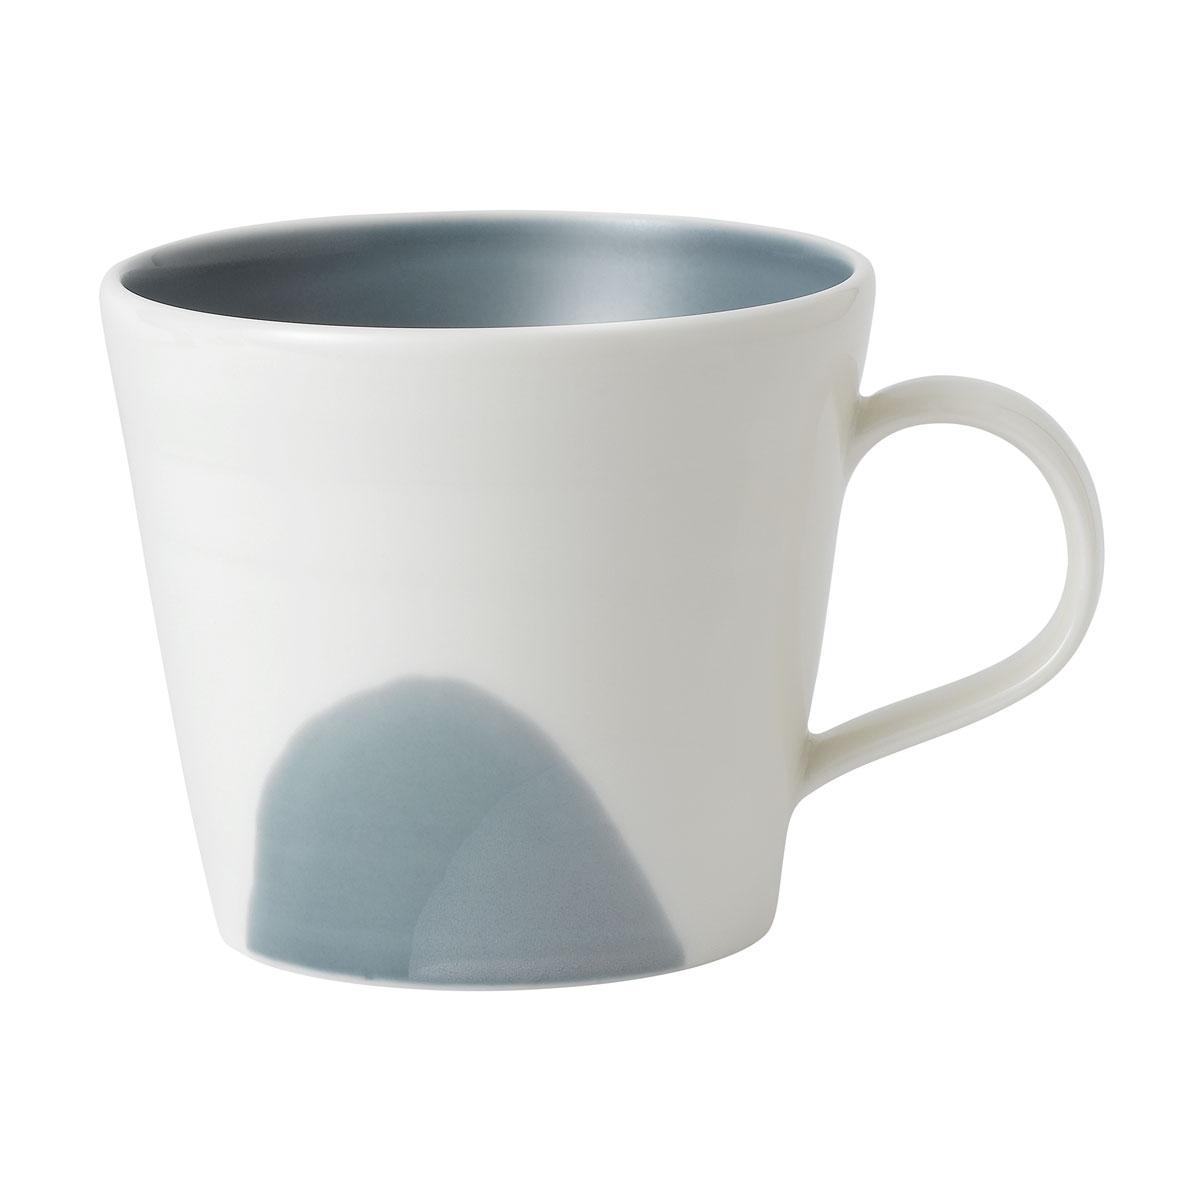 Royal Doulton Signature 1815, Mug Blue, Single